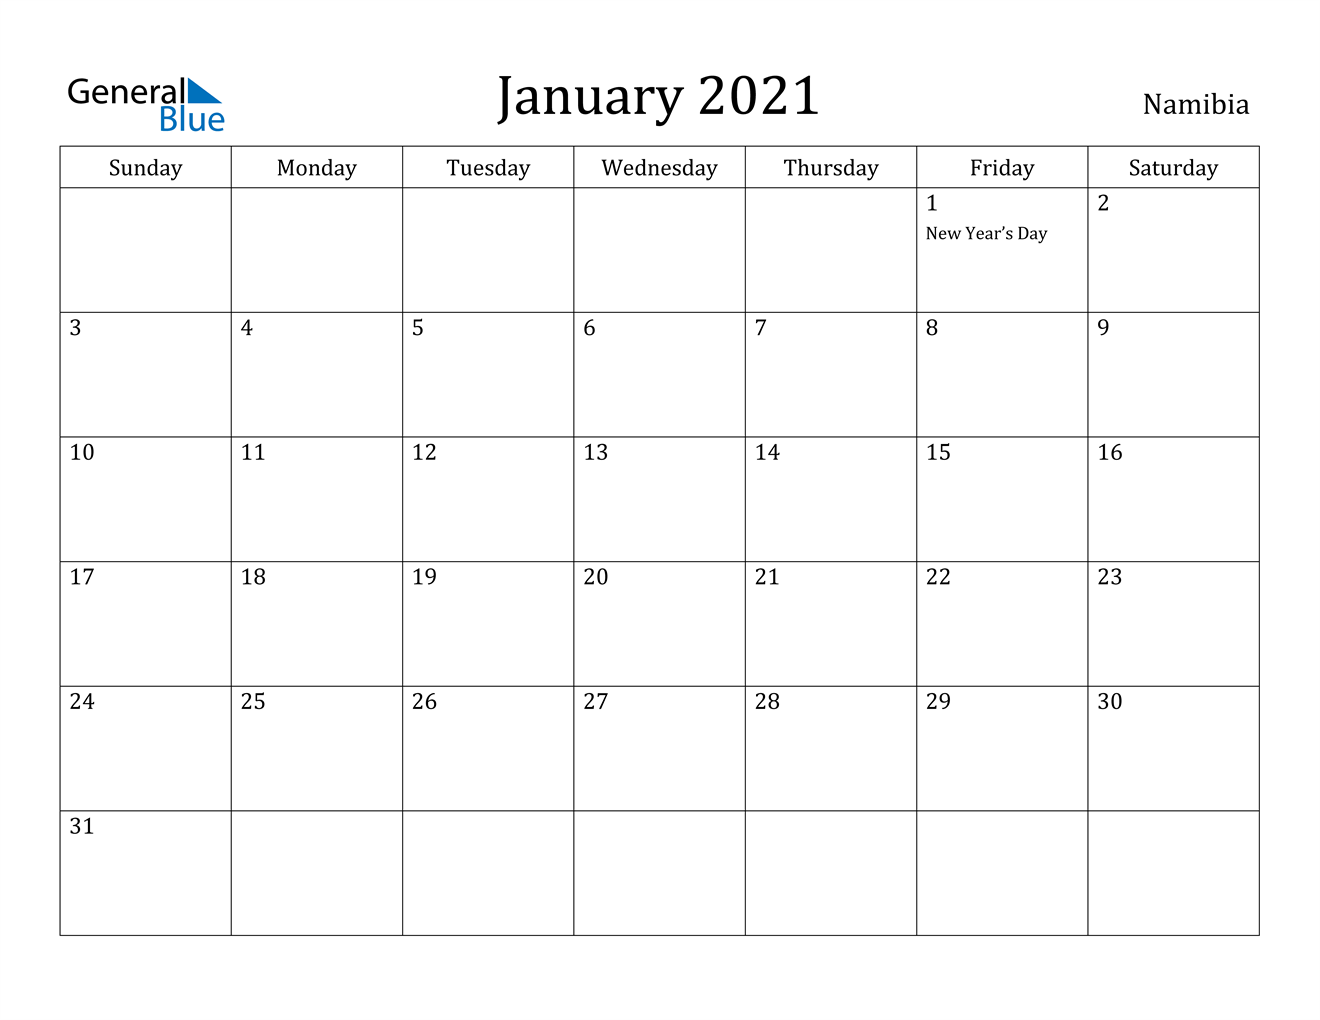 January 2021 Calendar Namibia